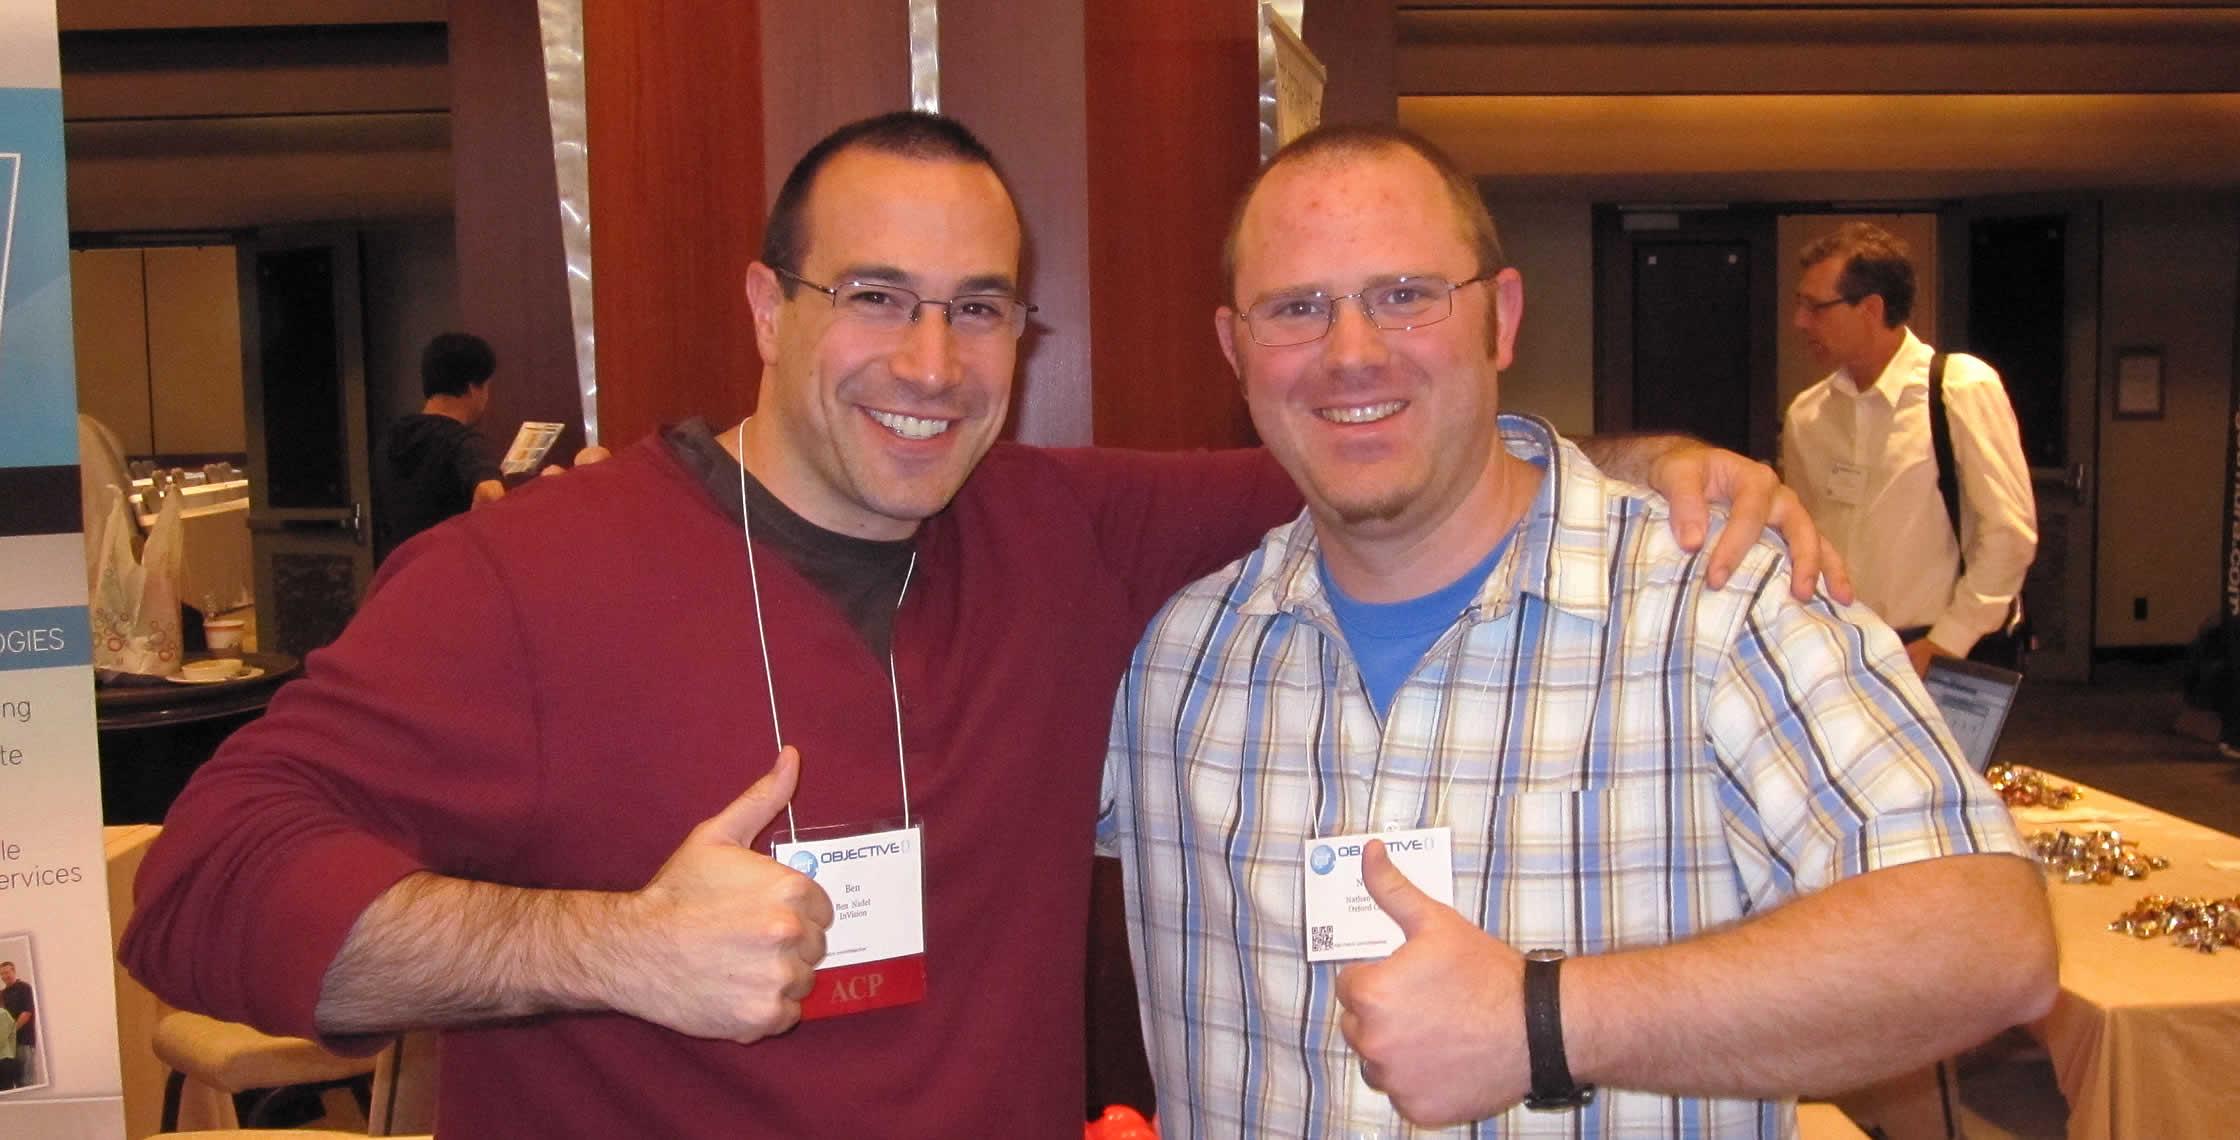 Ben Nadel at cf.Objective() 2012 (Minneapolis, MN) with: Nathan DeJong